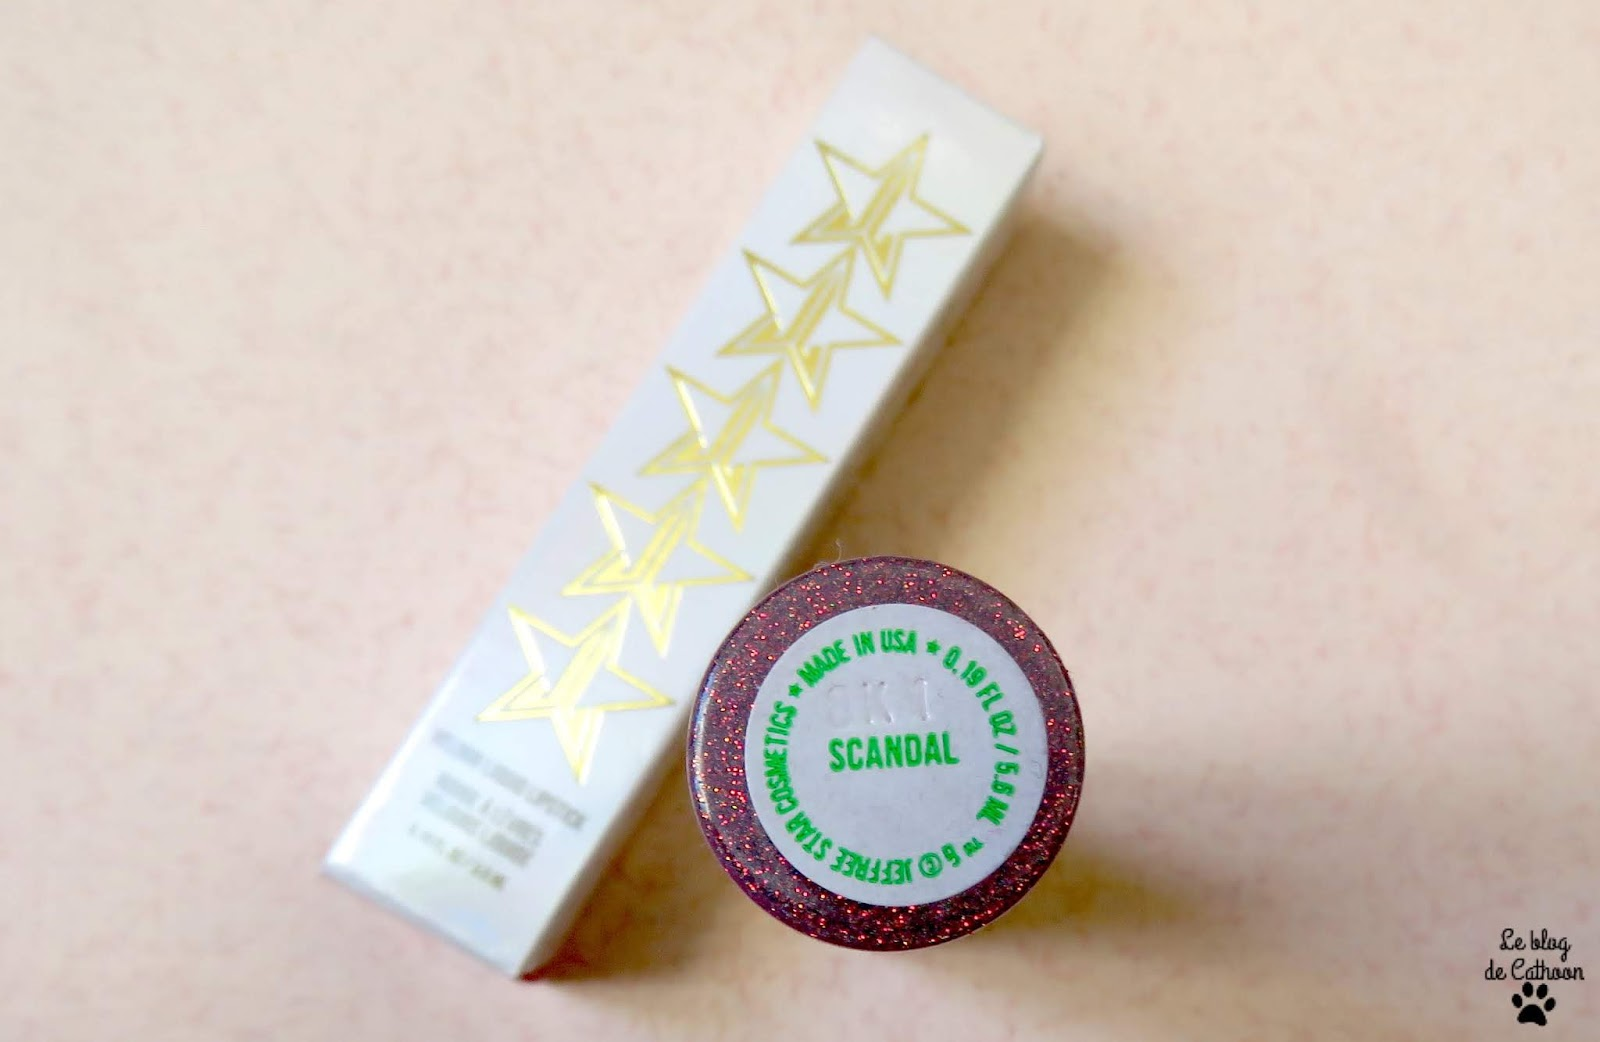 Velour Liquid Lipstick - Scandal - Jeffree Star Cosmetics